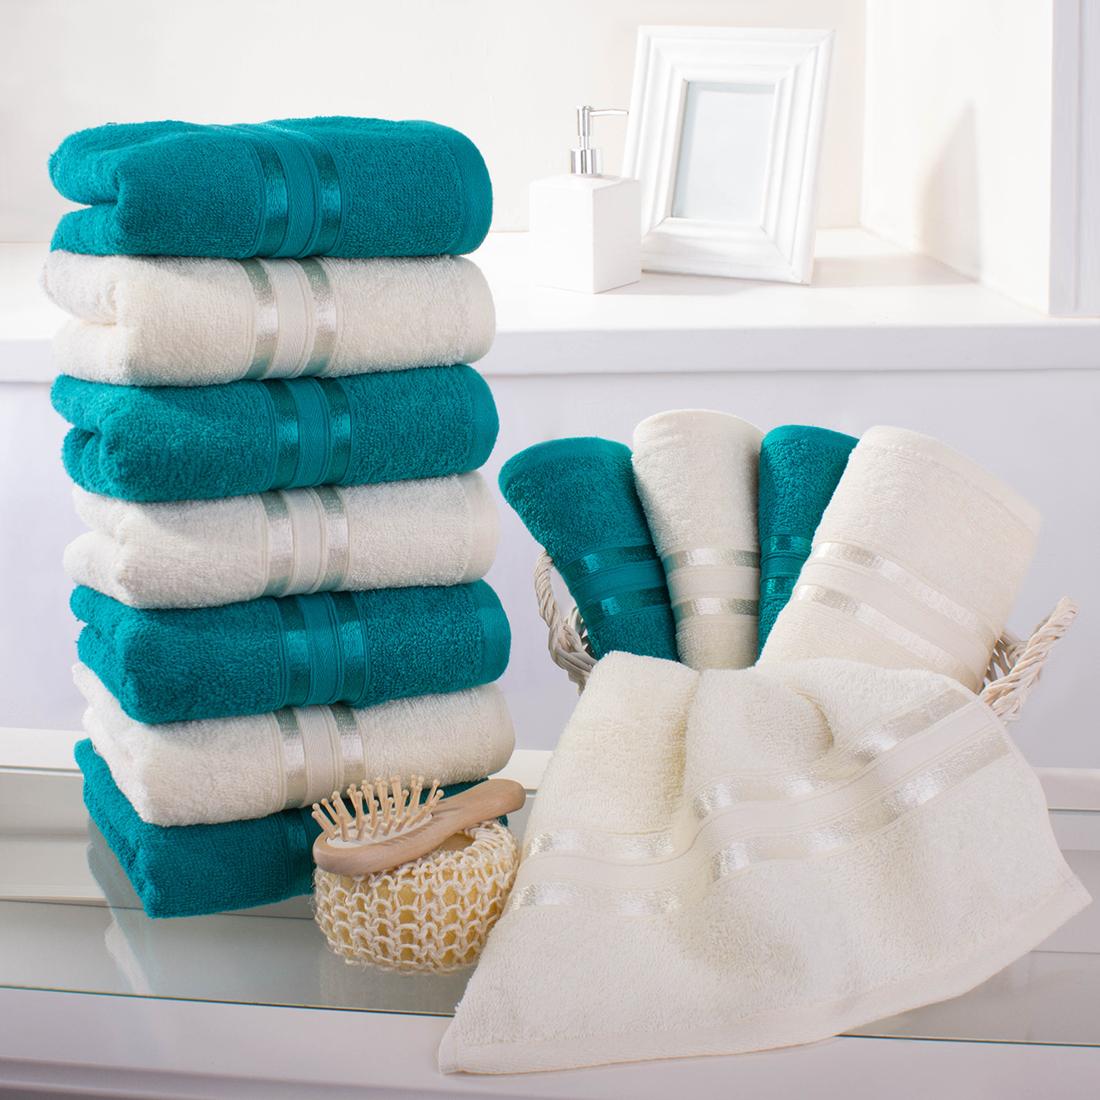 Купить Полотенца Dome, Полотенце для рук Harmonika Цвет: Молочный-Морская волна (33х50 см - 12 шт), Дания, Махра